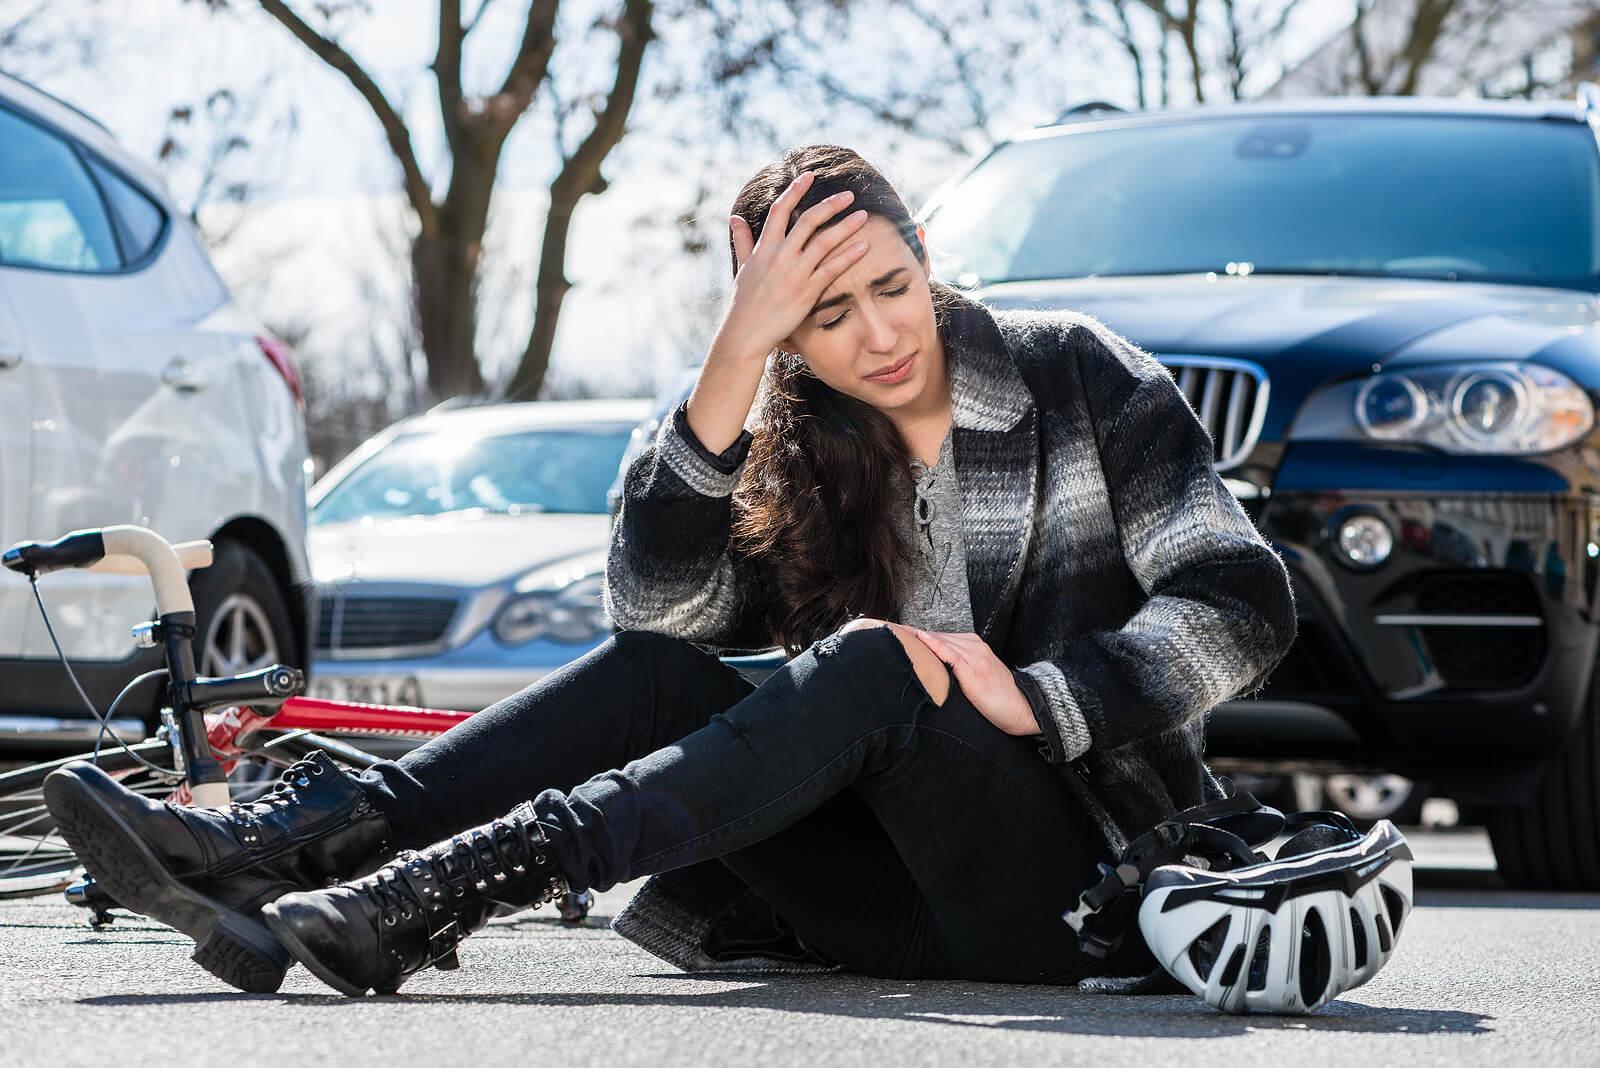 Bike Share Accident California